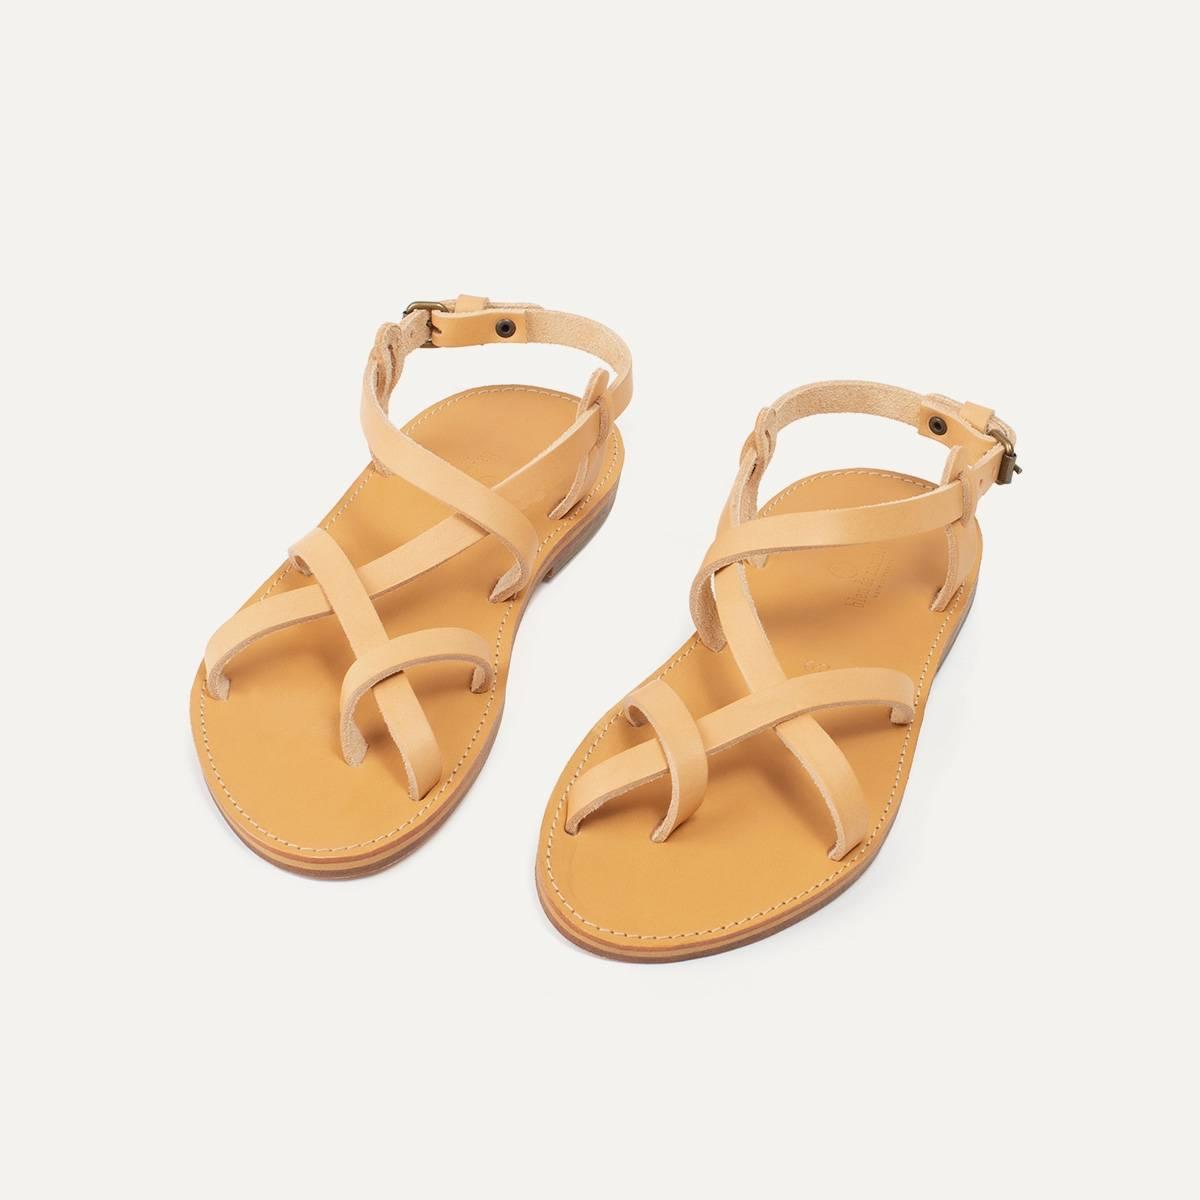 Nara leather sandals - Natural (image n°5)